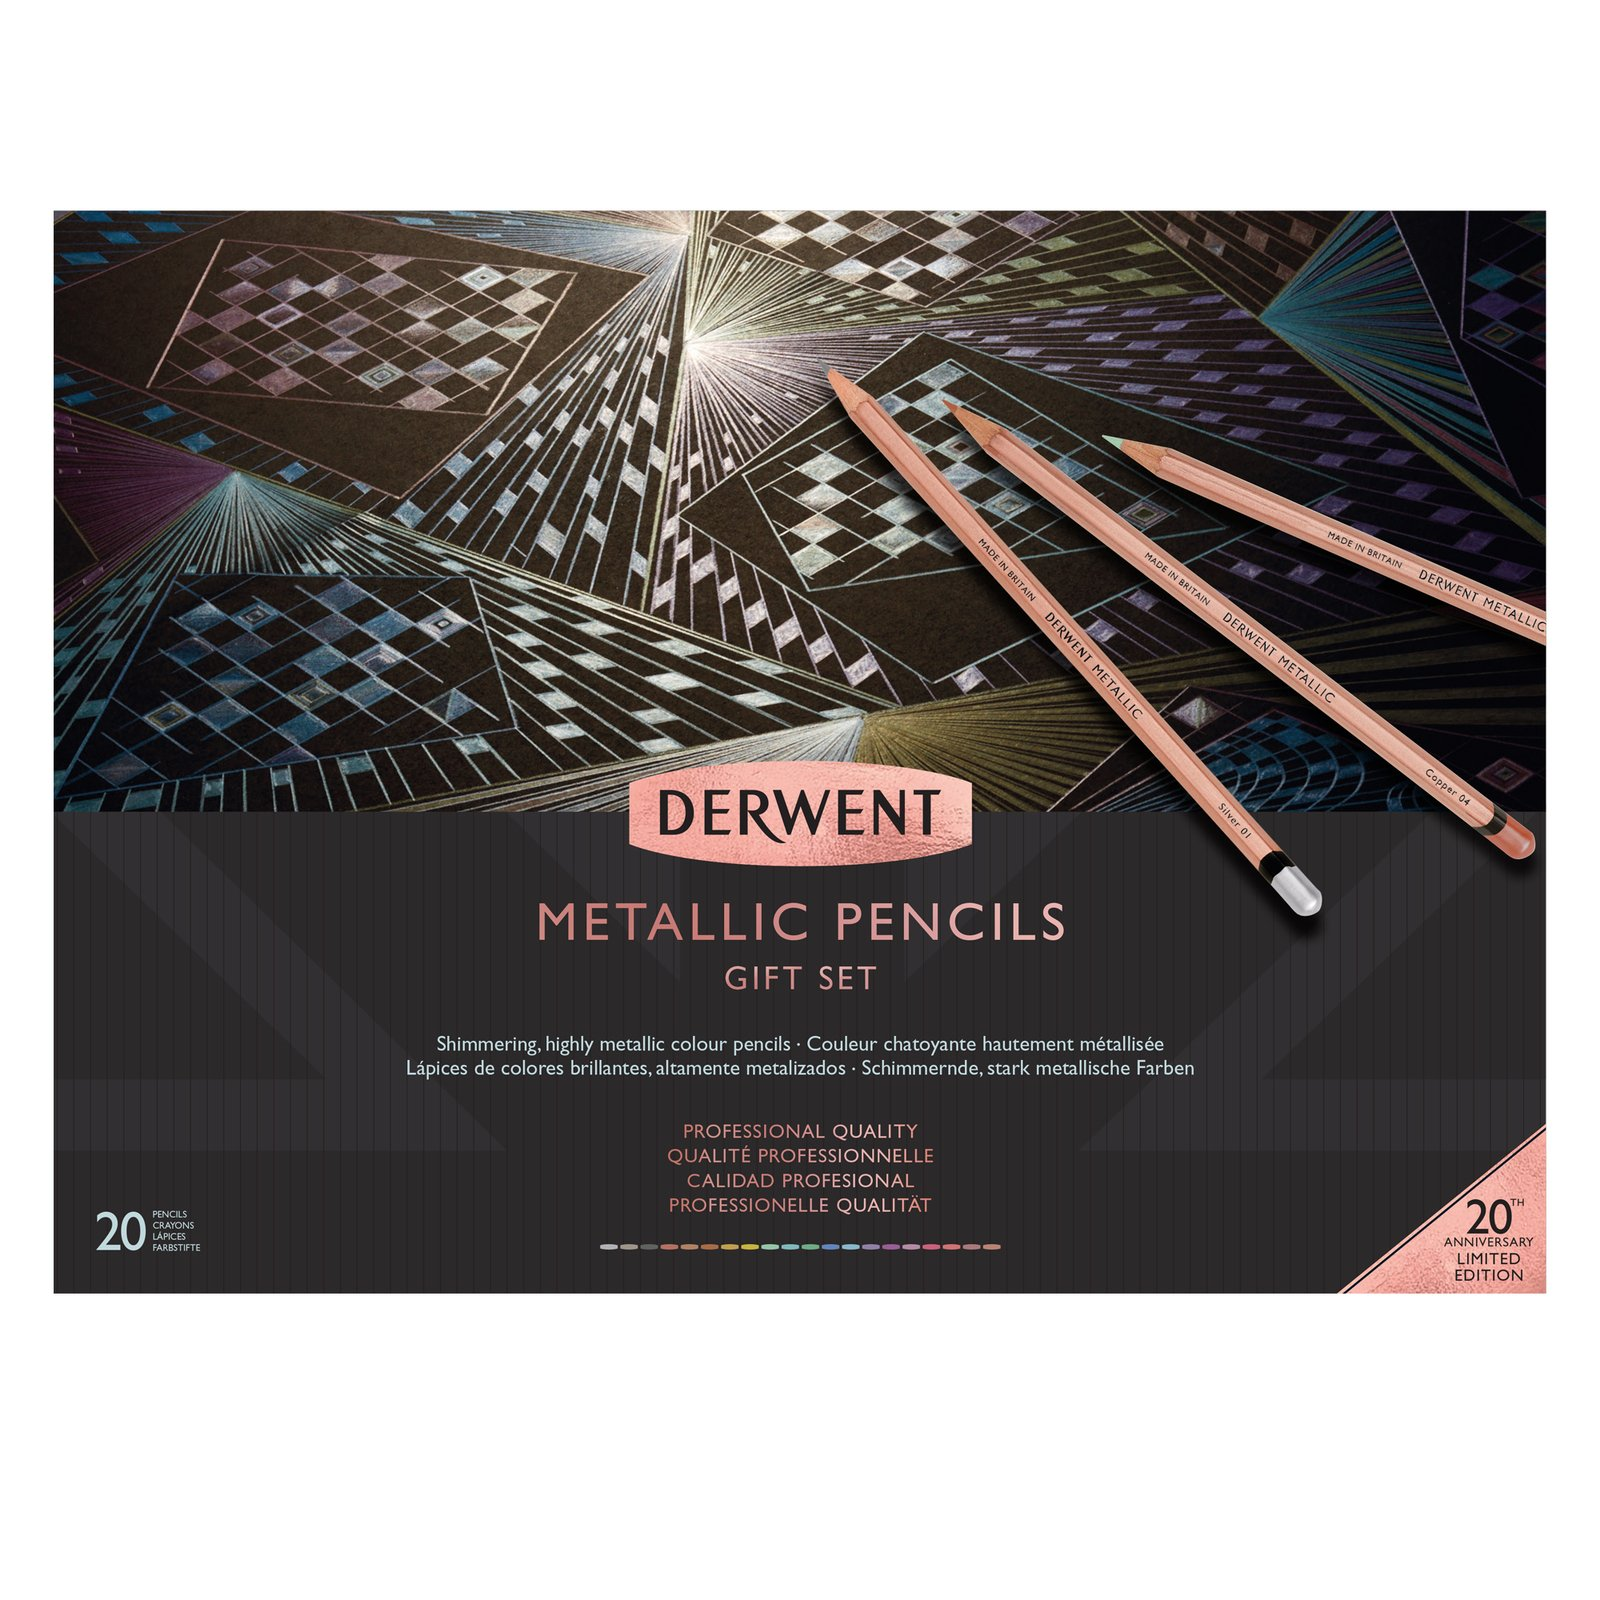 Derwent 20th Anniversary 20 Color Metallic Pencil Set